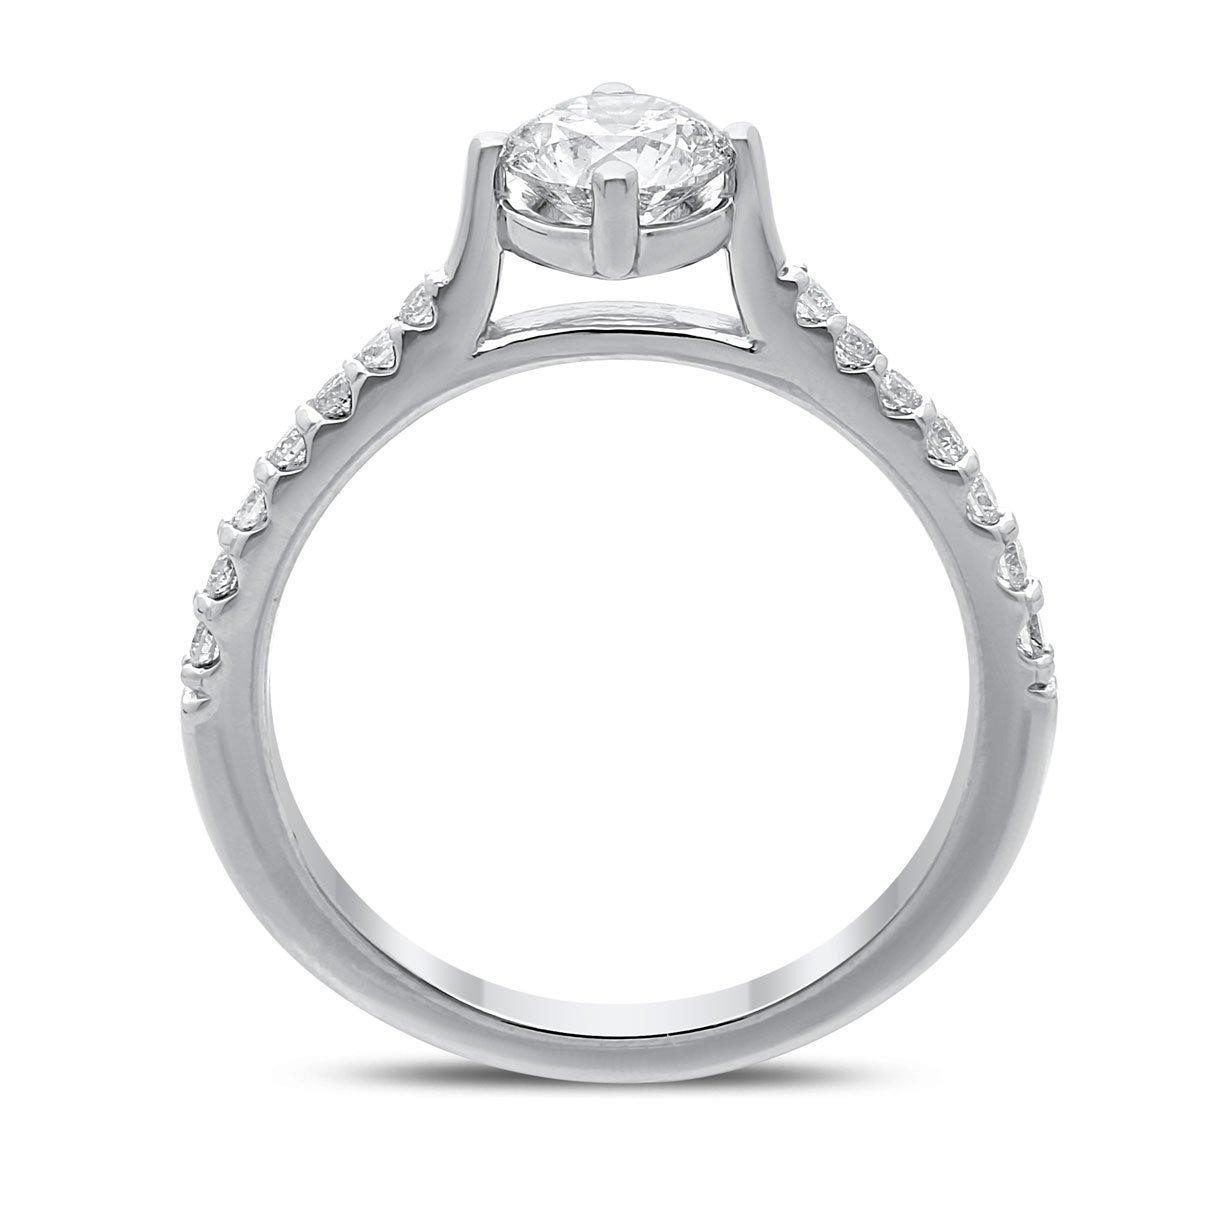 Alana Diamond Ring in White Gold - madeinUSAdiamonds